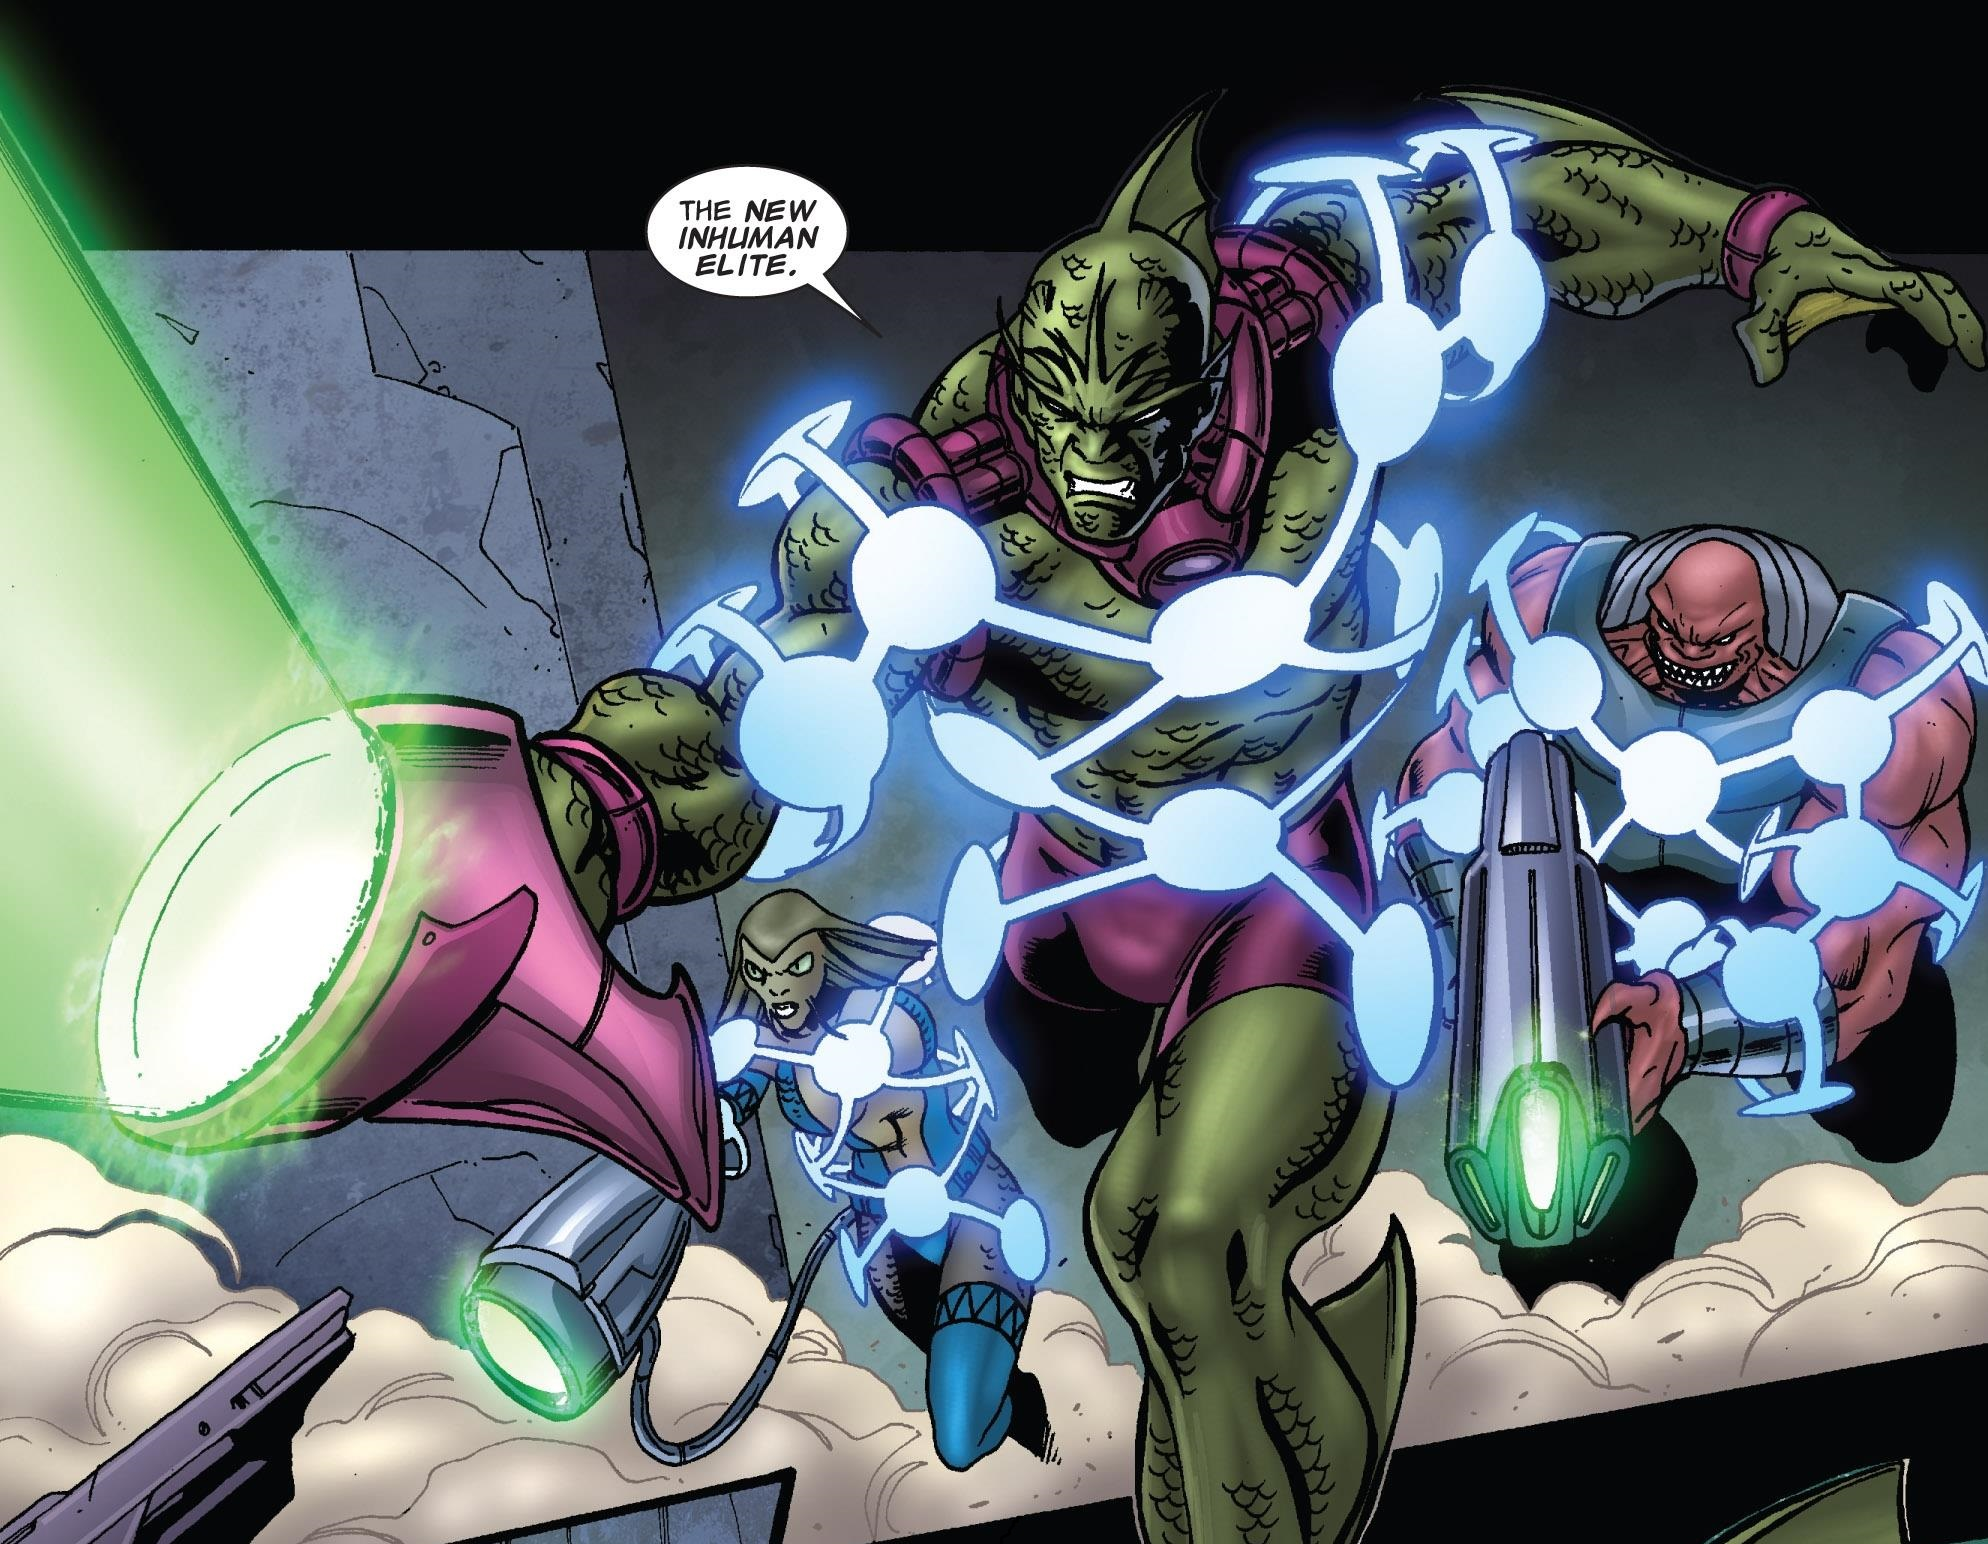 New Inhuman Elite (Earth-616)/Gallery